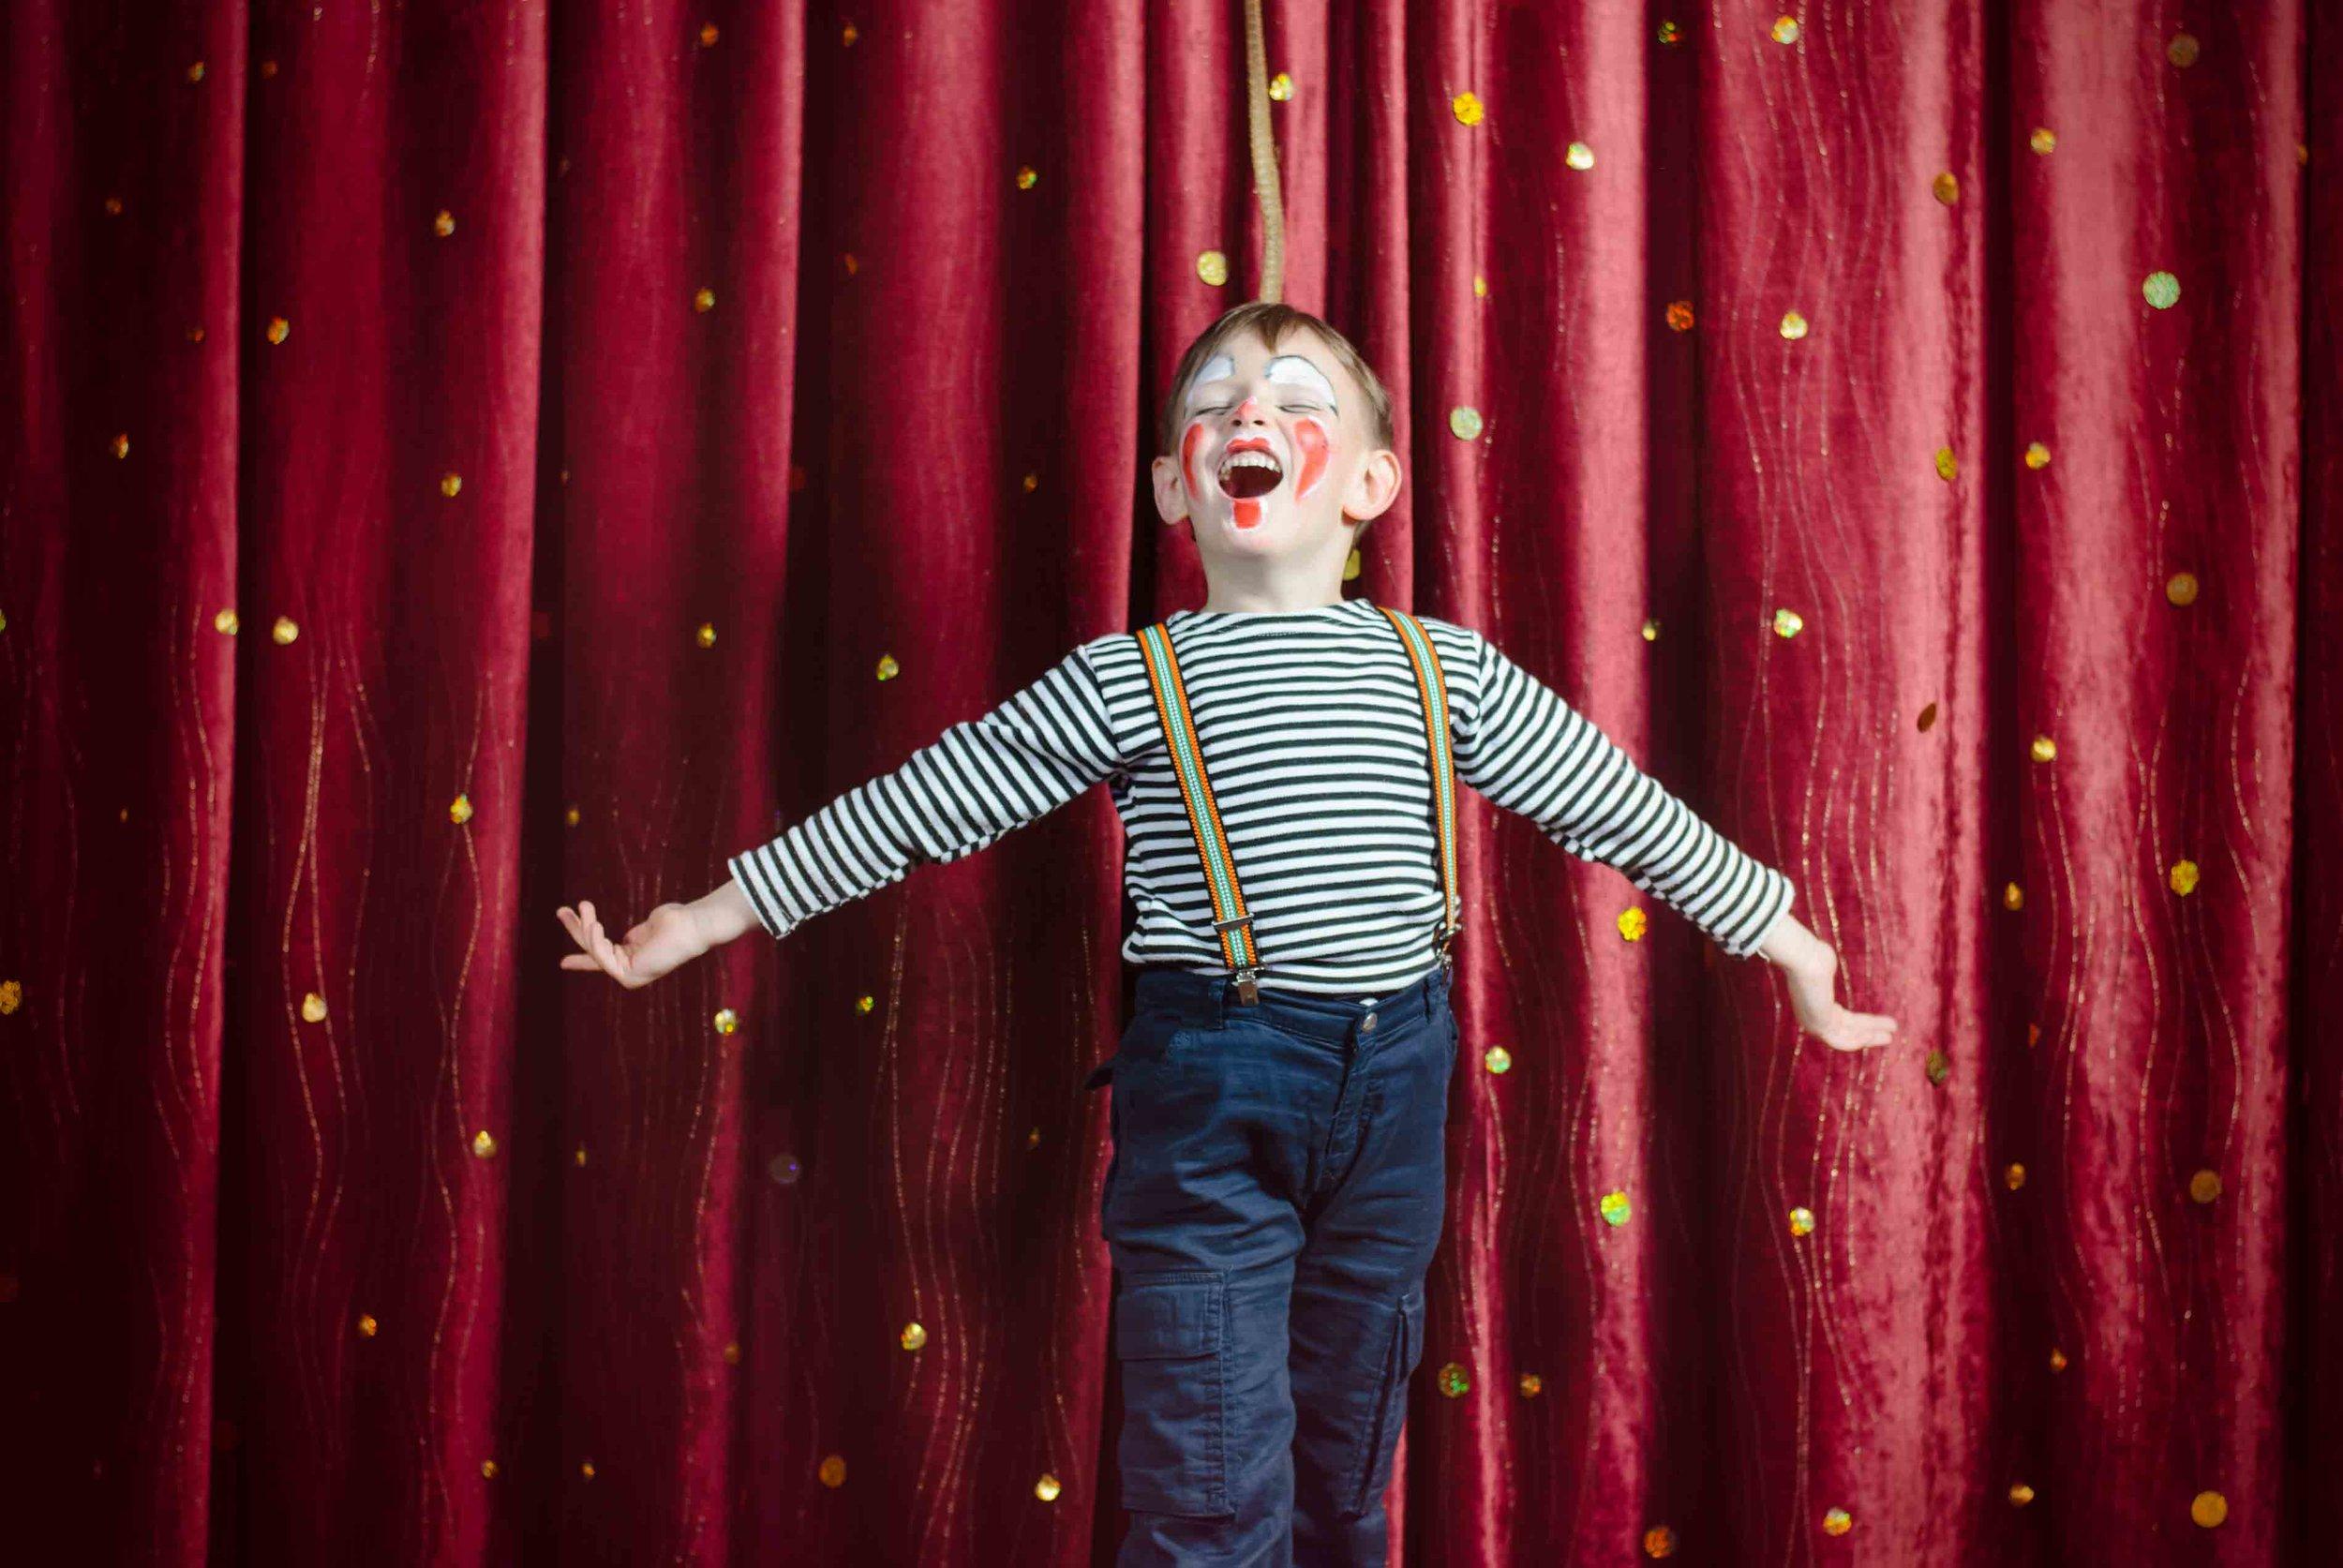 Children's Theatre Classes in Chicago